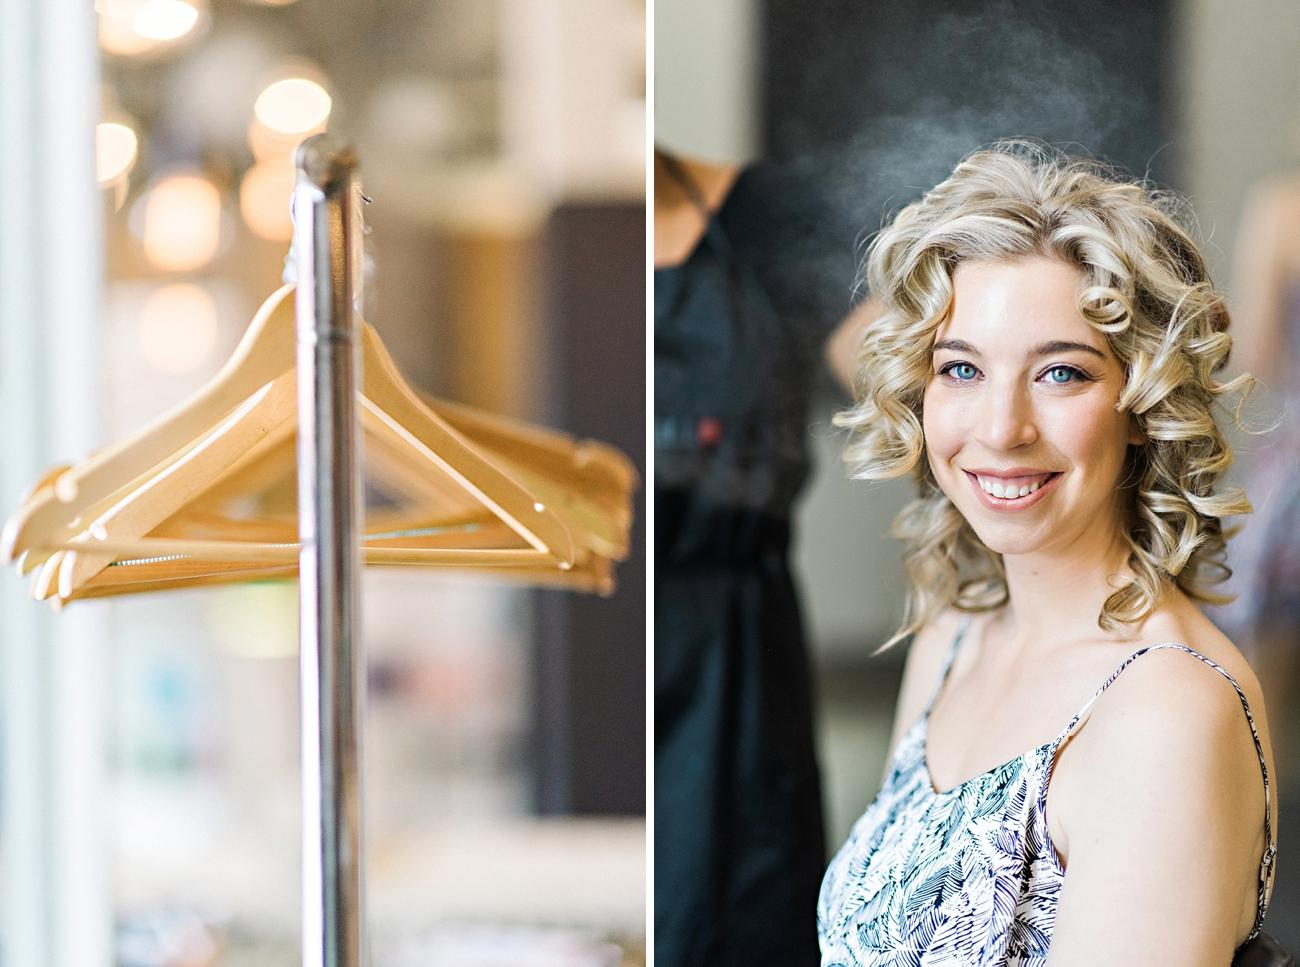 Sara-Seans-Halifax-Prince-George-Hotel-Wedding006.jpg